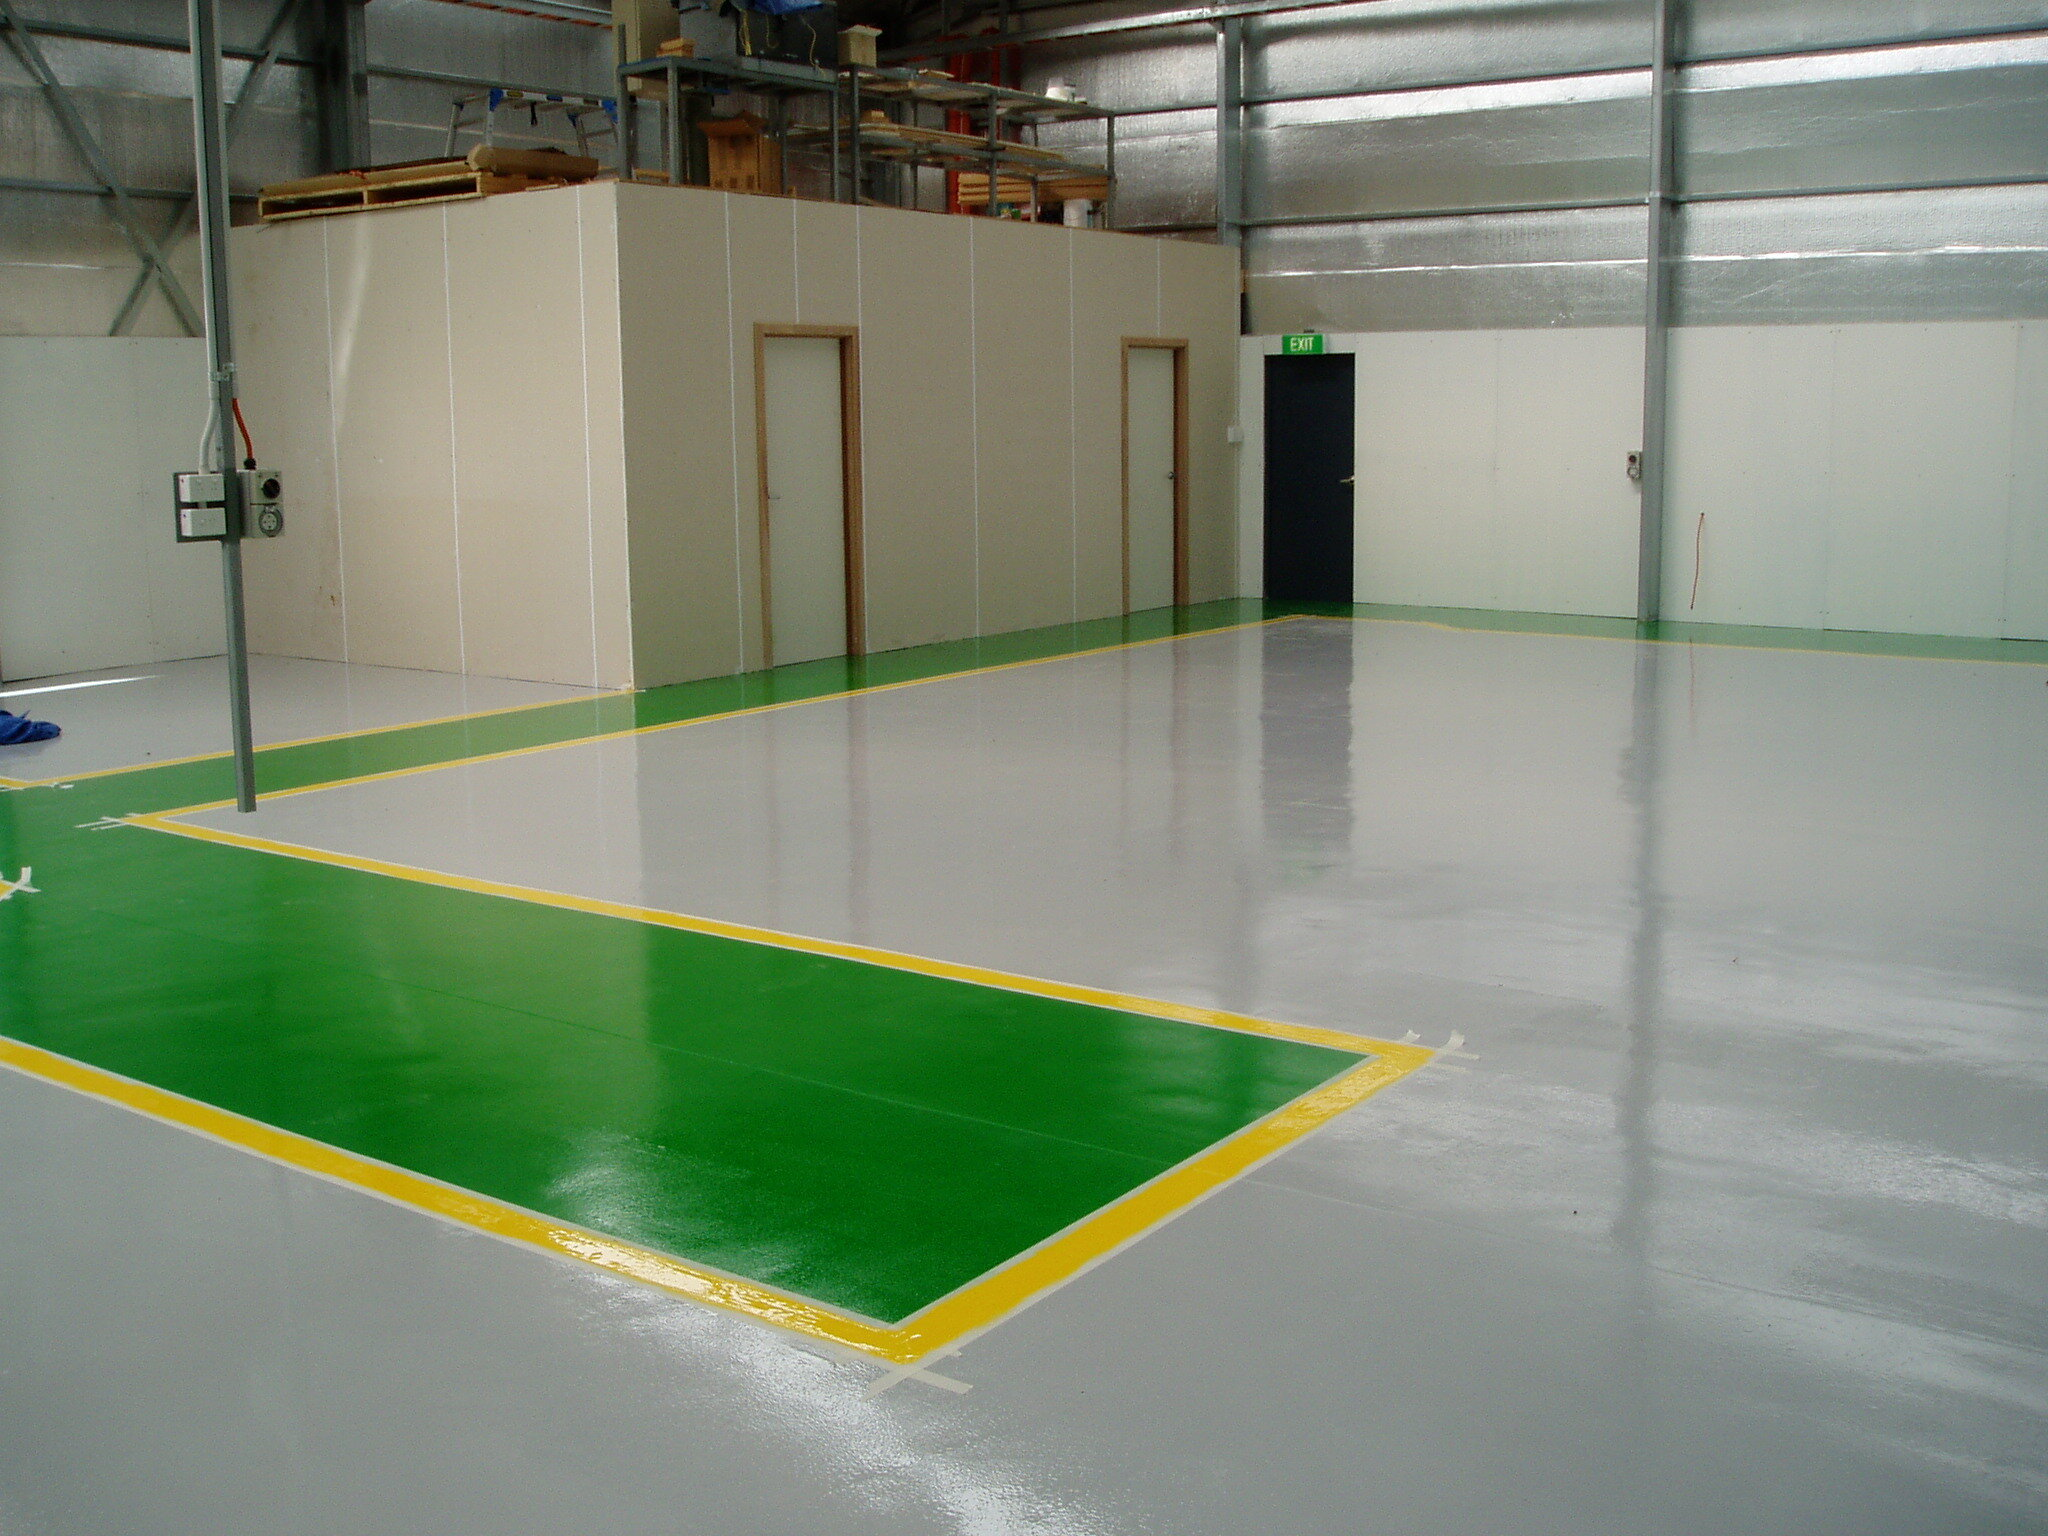 Lloyd-Winery-Floor-2.jpg